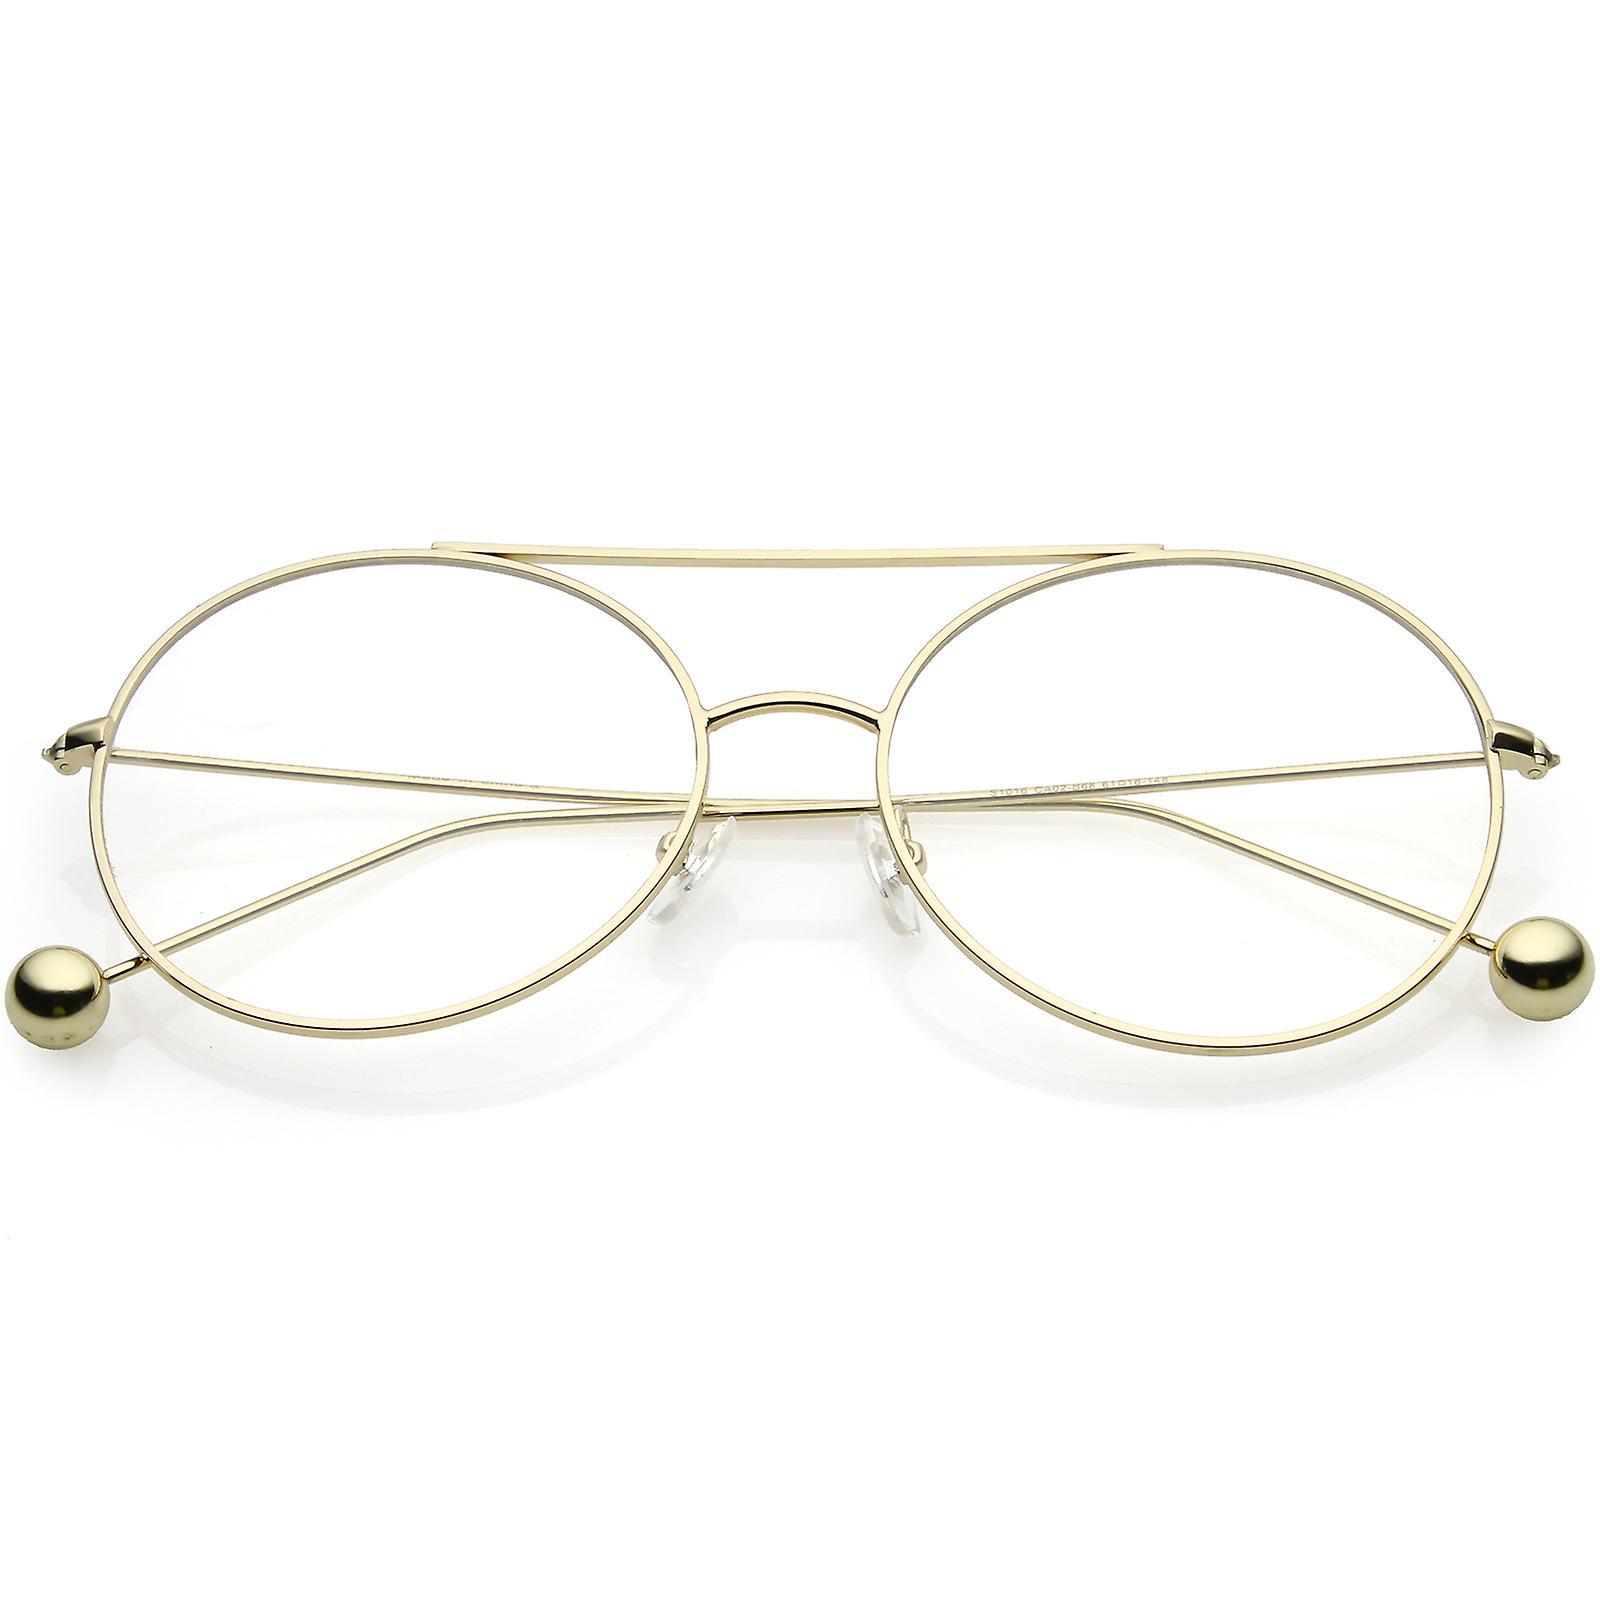 0ab4f6930eb Premium Oversize Round Eyeglasses Metal Double Nose Bridge Clear Flat Lens  59mm